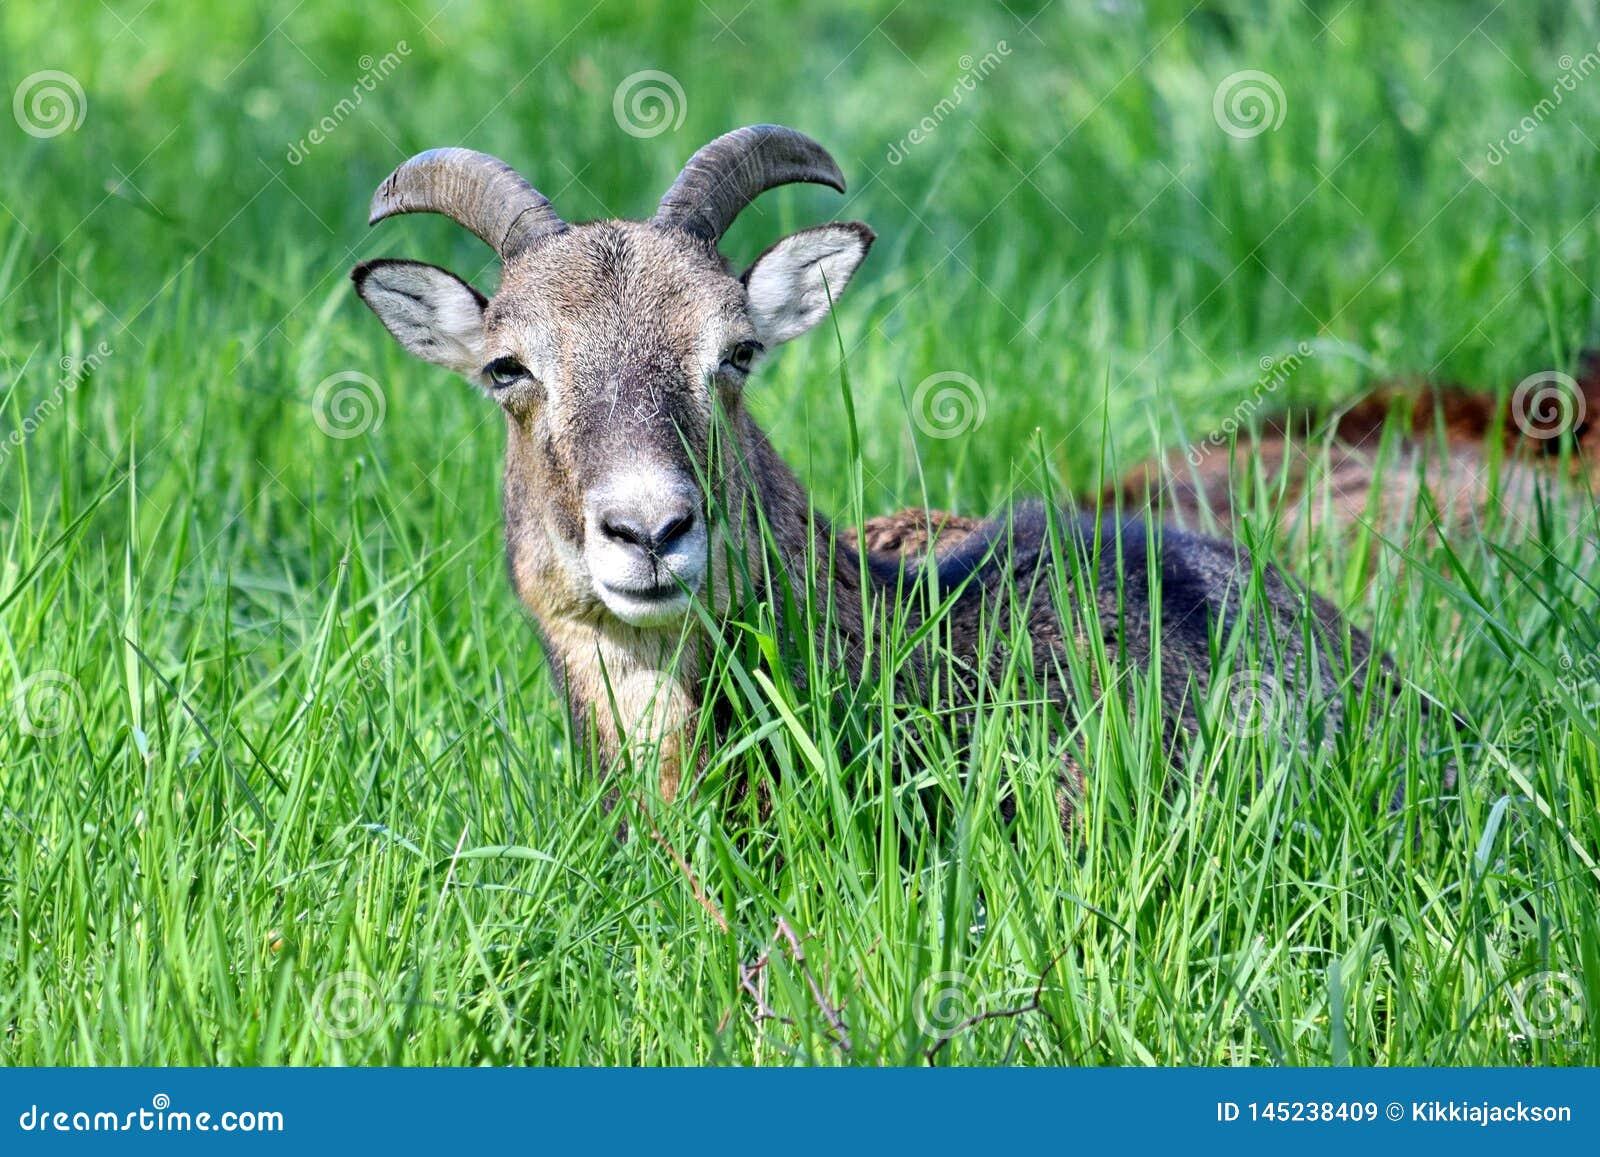 Mouflon-Ovis Aries Musimon Lying in der Gras-Nahaufnahme